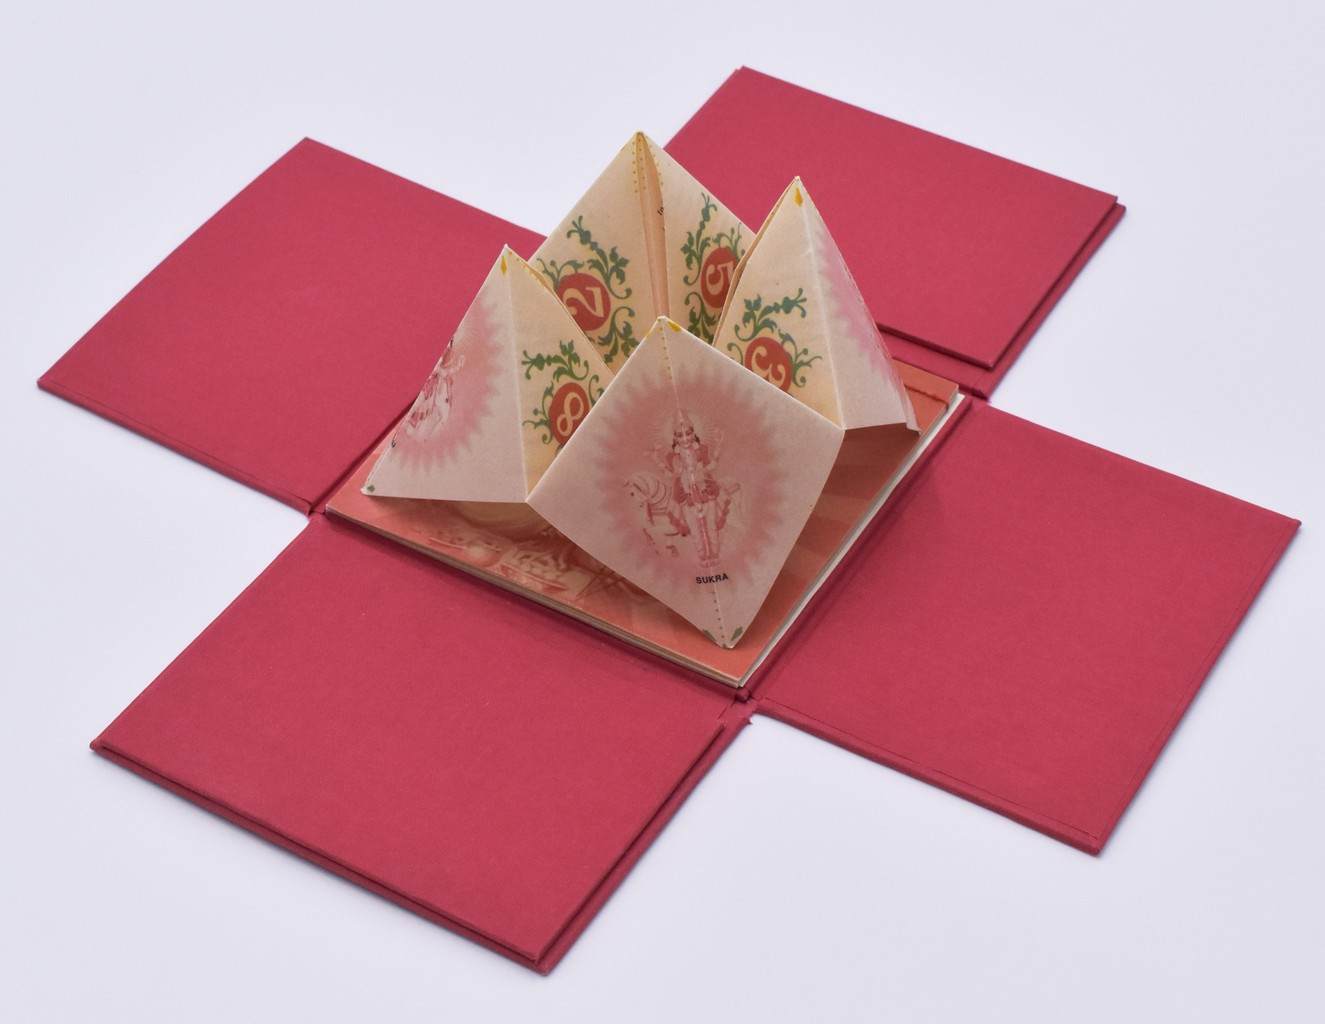 Fortune teller artist's book in open box